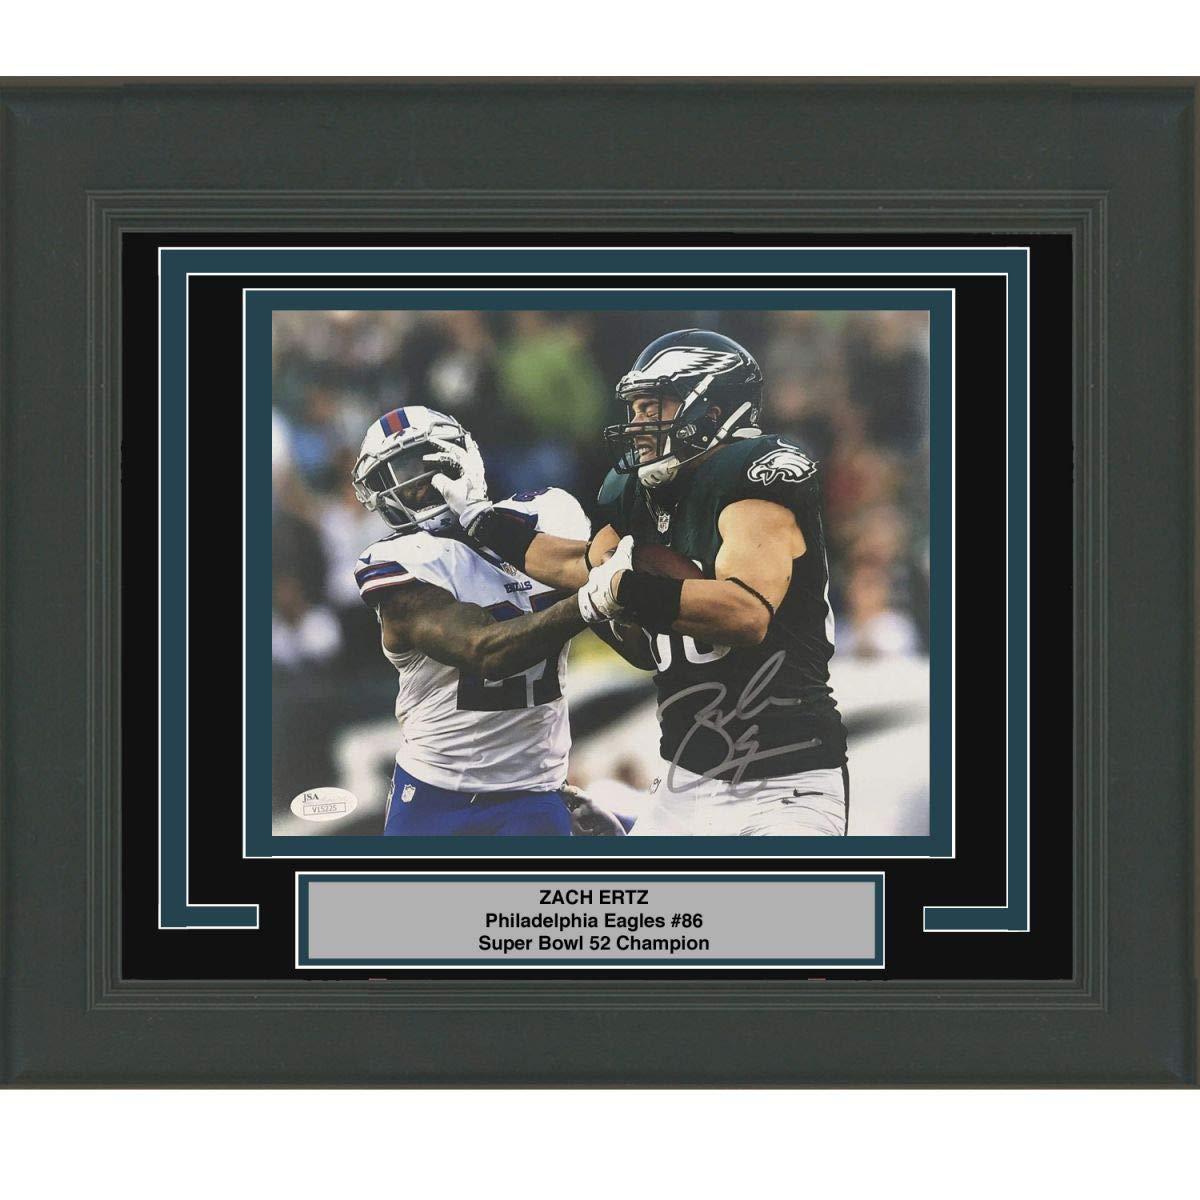 0c32697d798 Framed Autographed/Signed Zach Ertz Philadelphia Eagles Stiff-Arm 8x10  Football Photo JSA COA at Amazon's Sports Collectibles Store